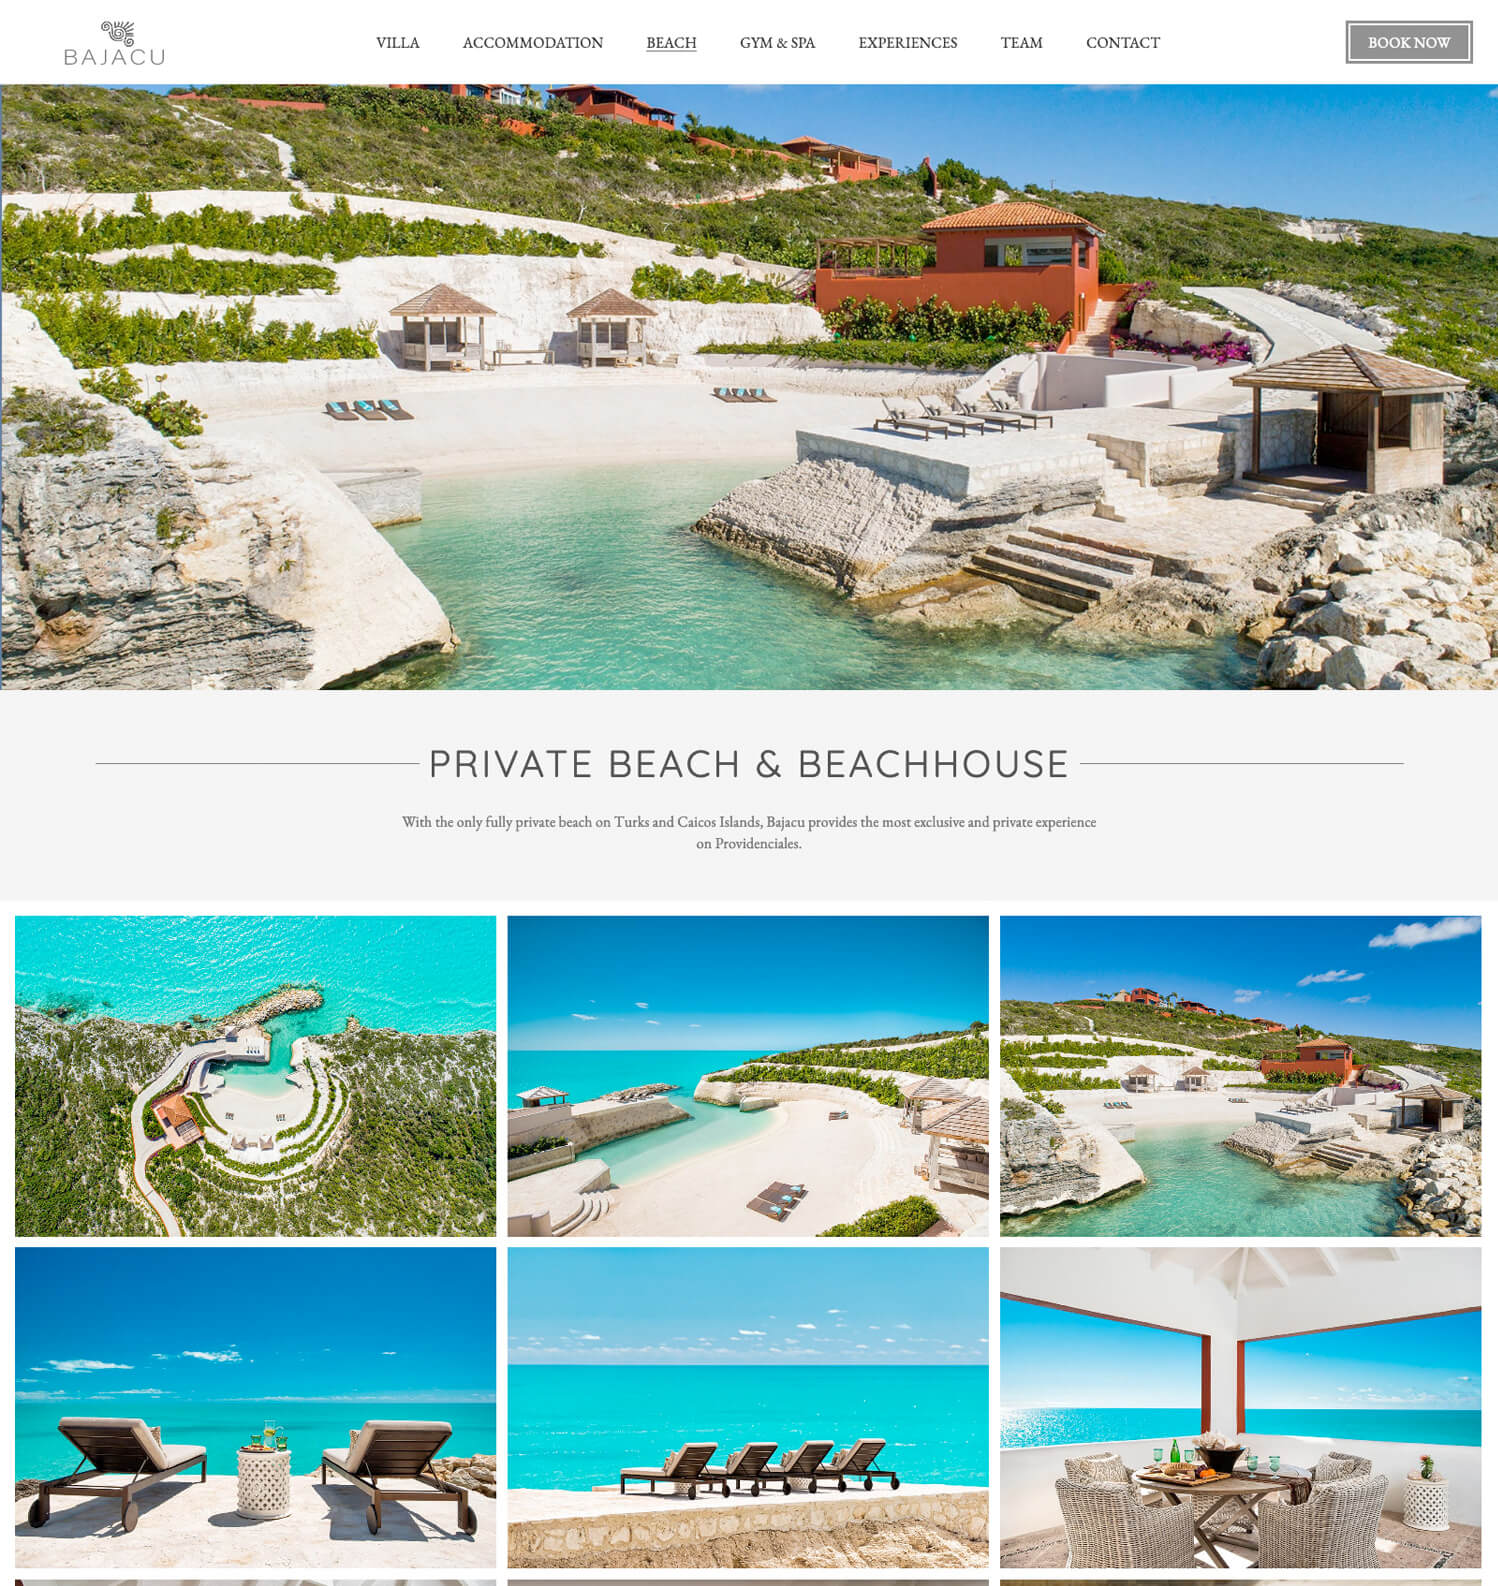 Bajacu Web Design - Inner page